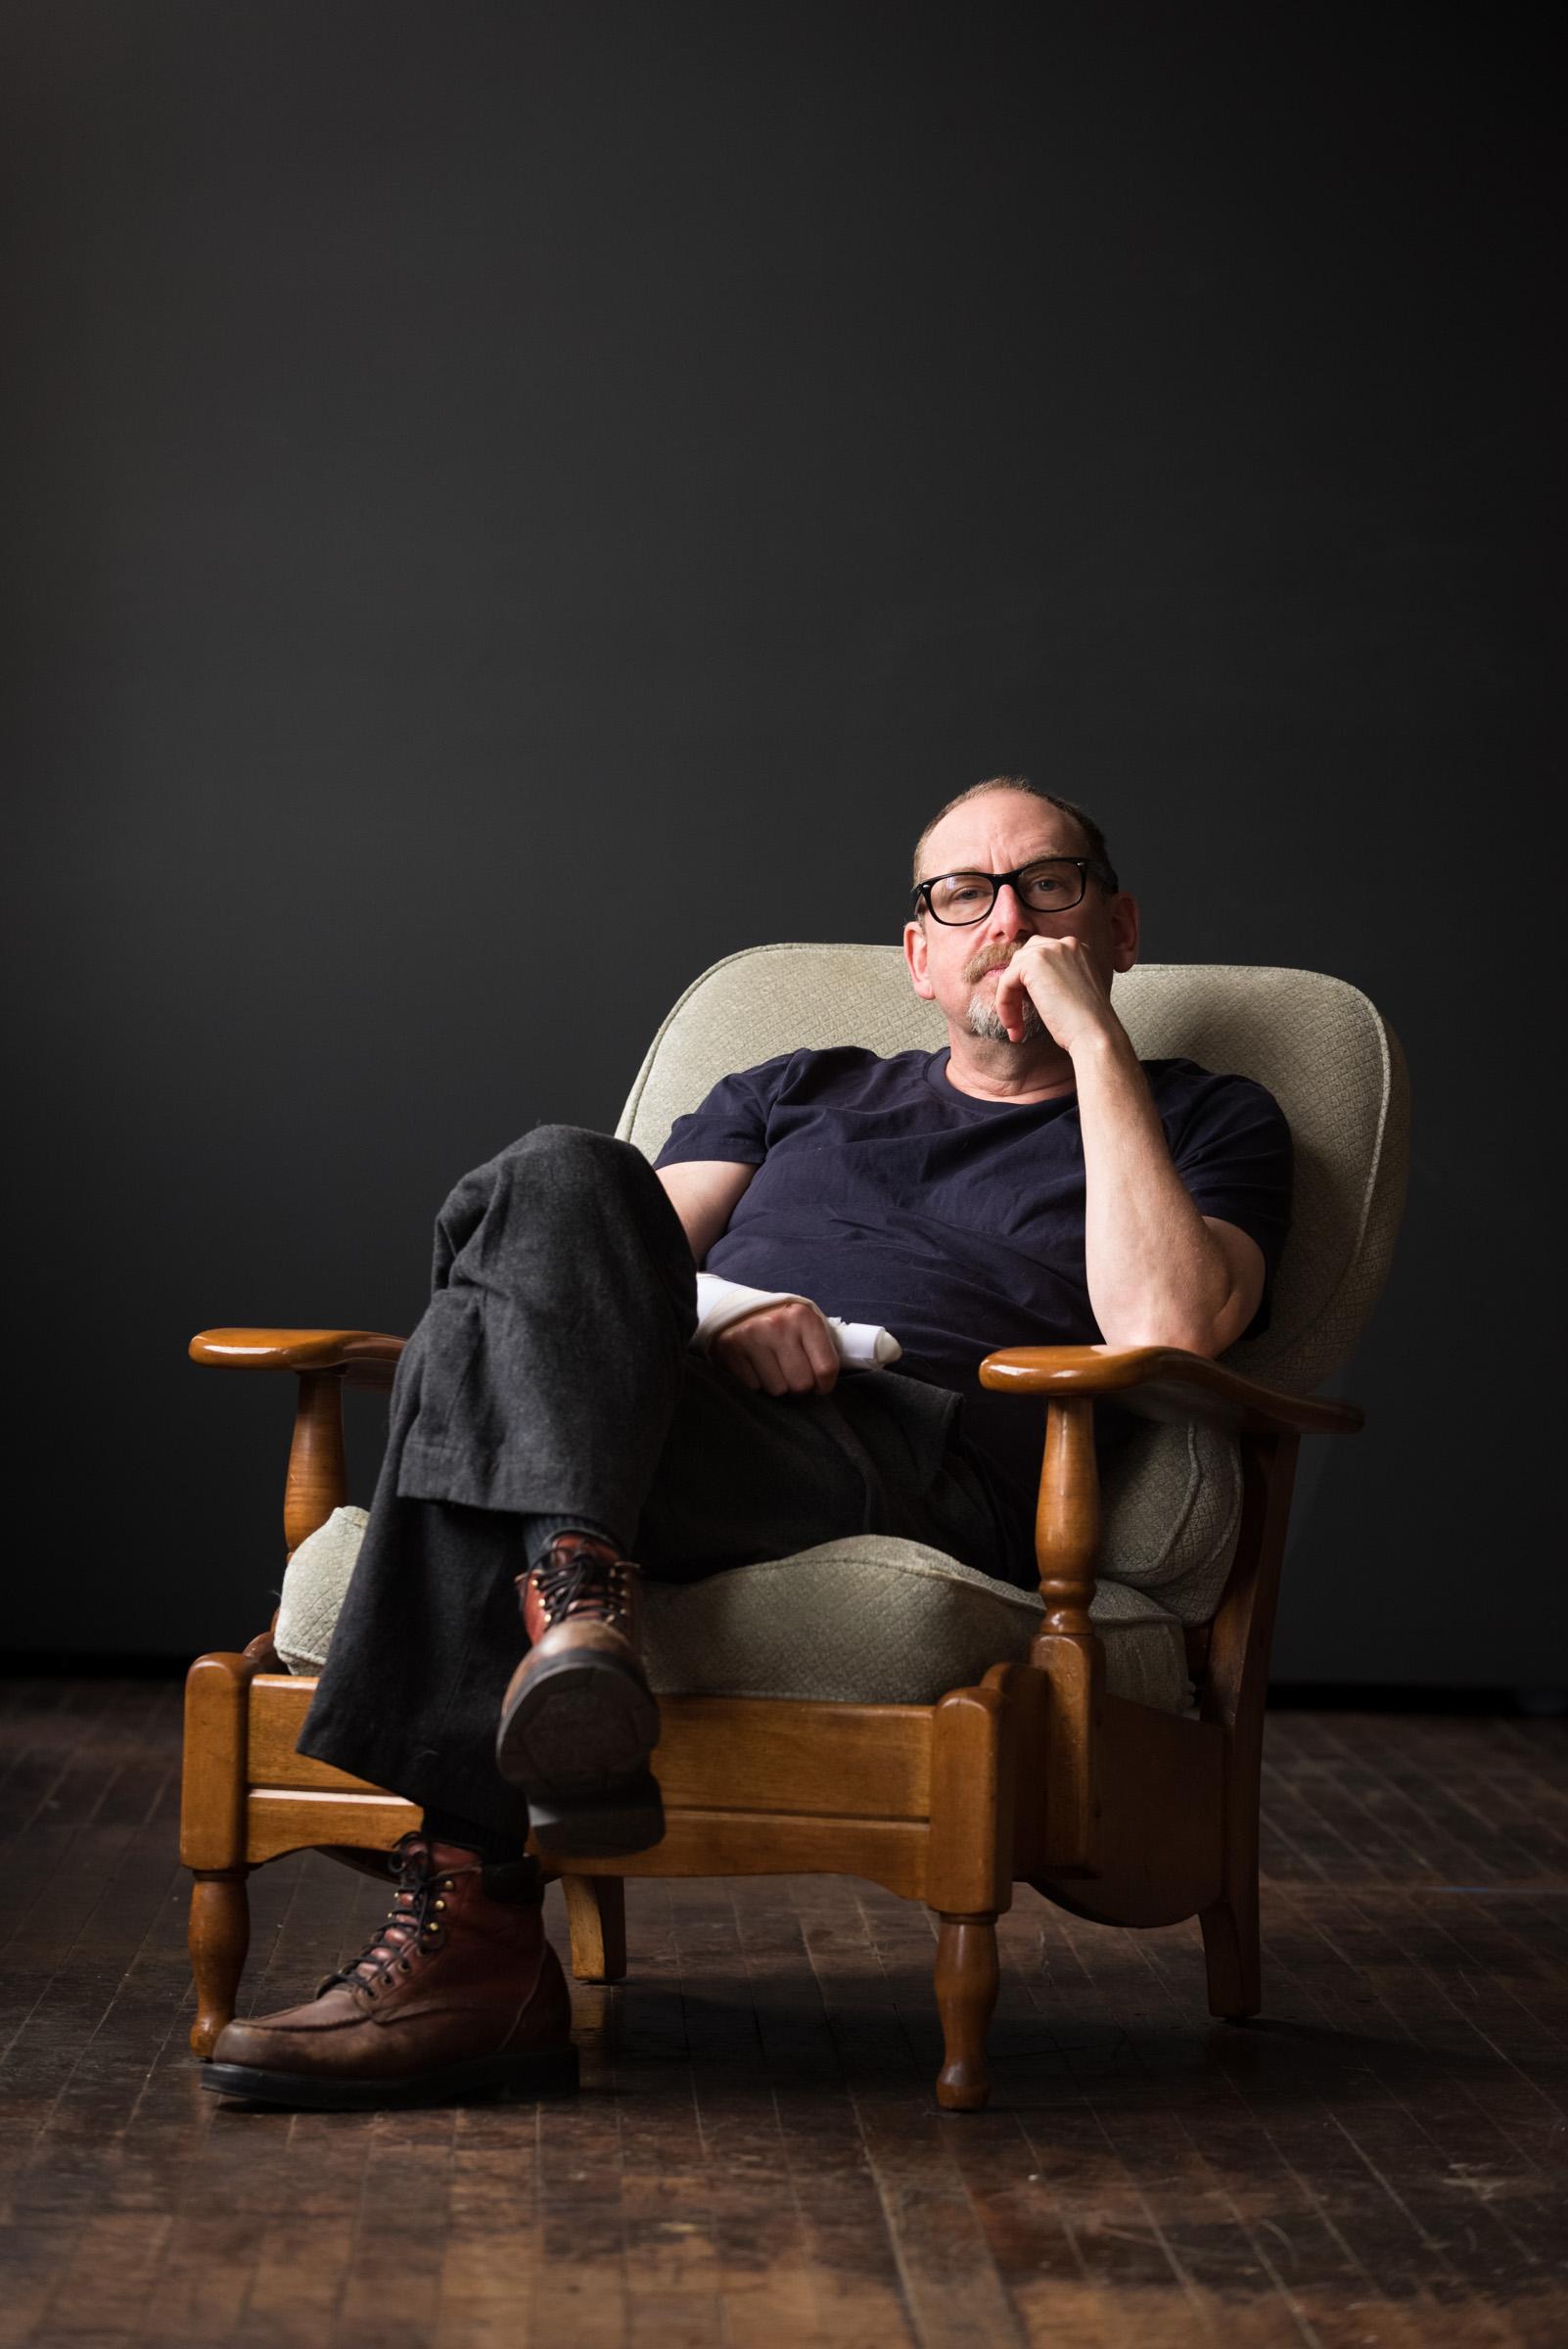 Cleveland-Portrait-Photographer-Angelo-Merendino129.jpg